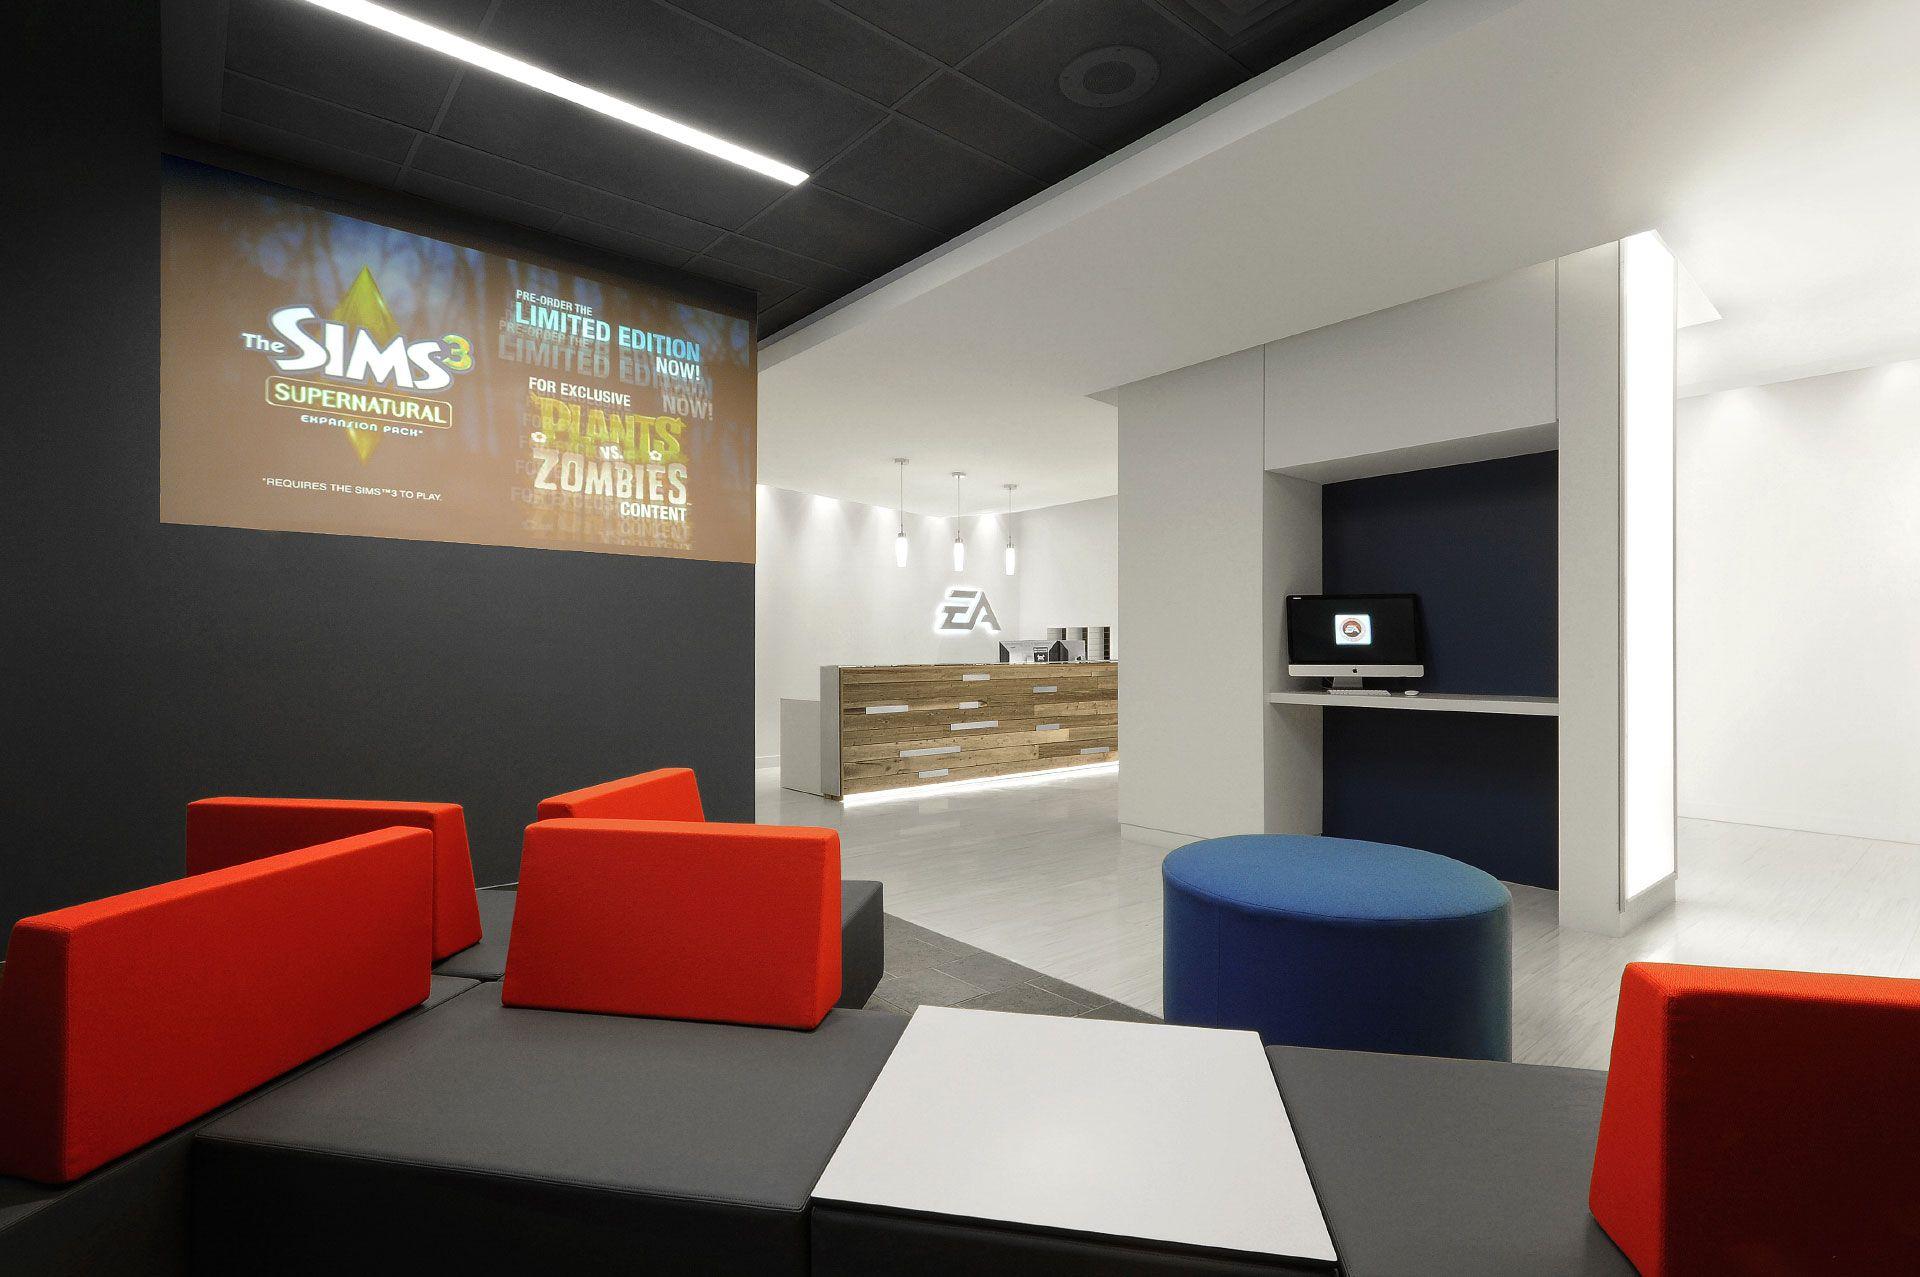 Ea Office By Kiva Design #Design #Color #Office #Reception #Modern